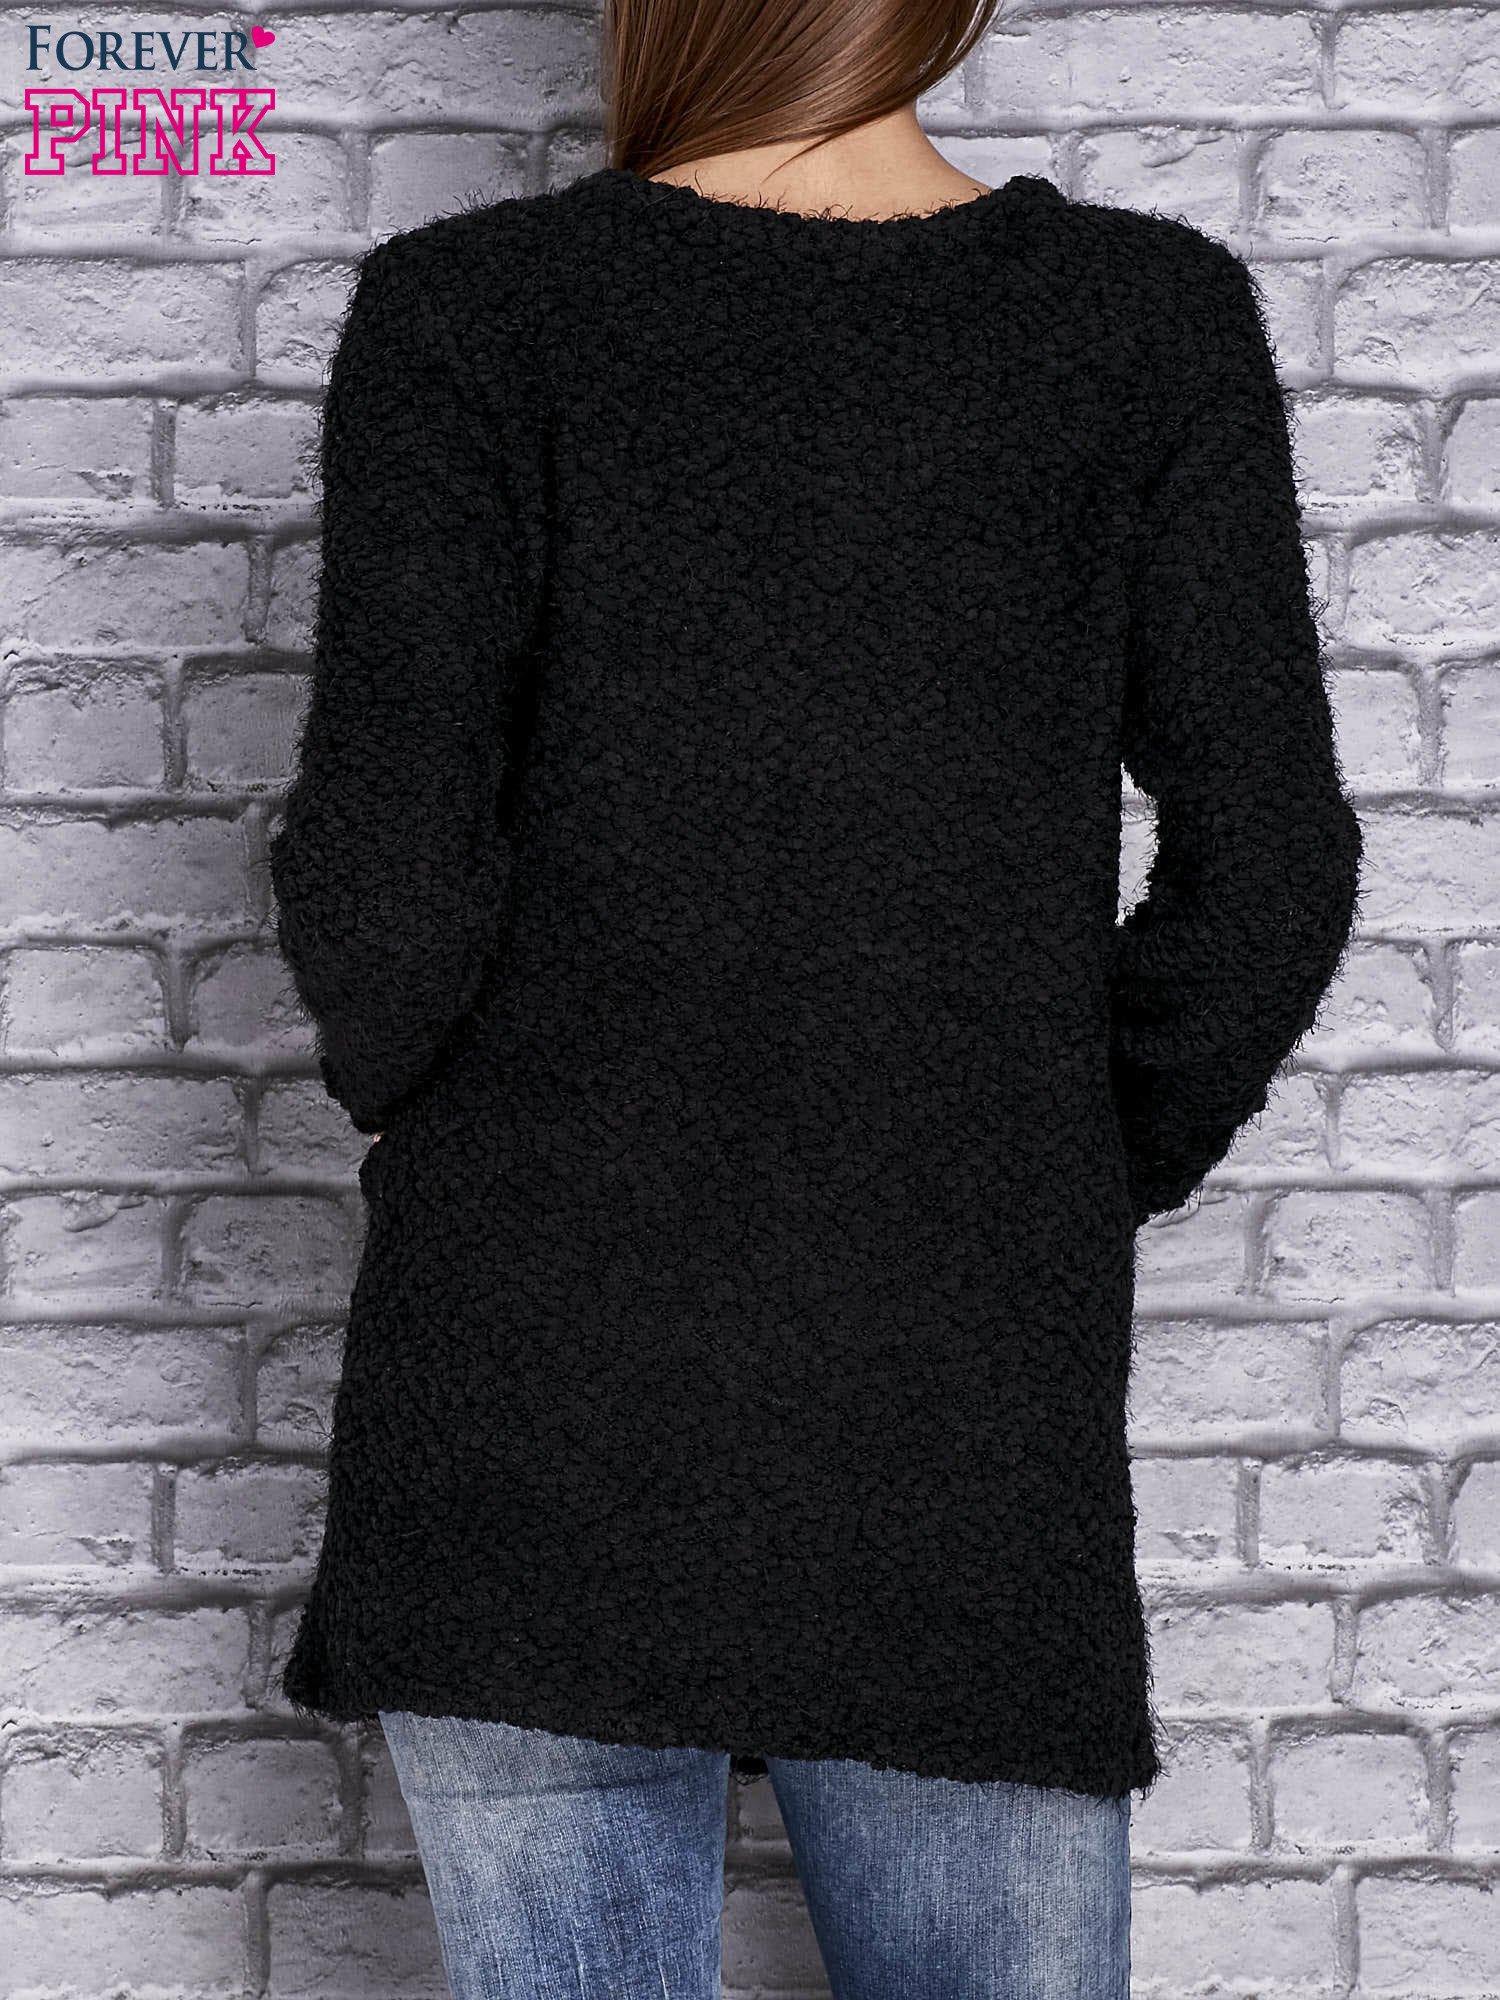 3fdd8716a0d2 Czarny sweter long hair zapinany na suwak - Sweter długi - sklep ...